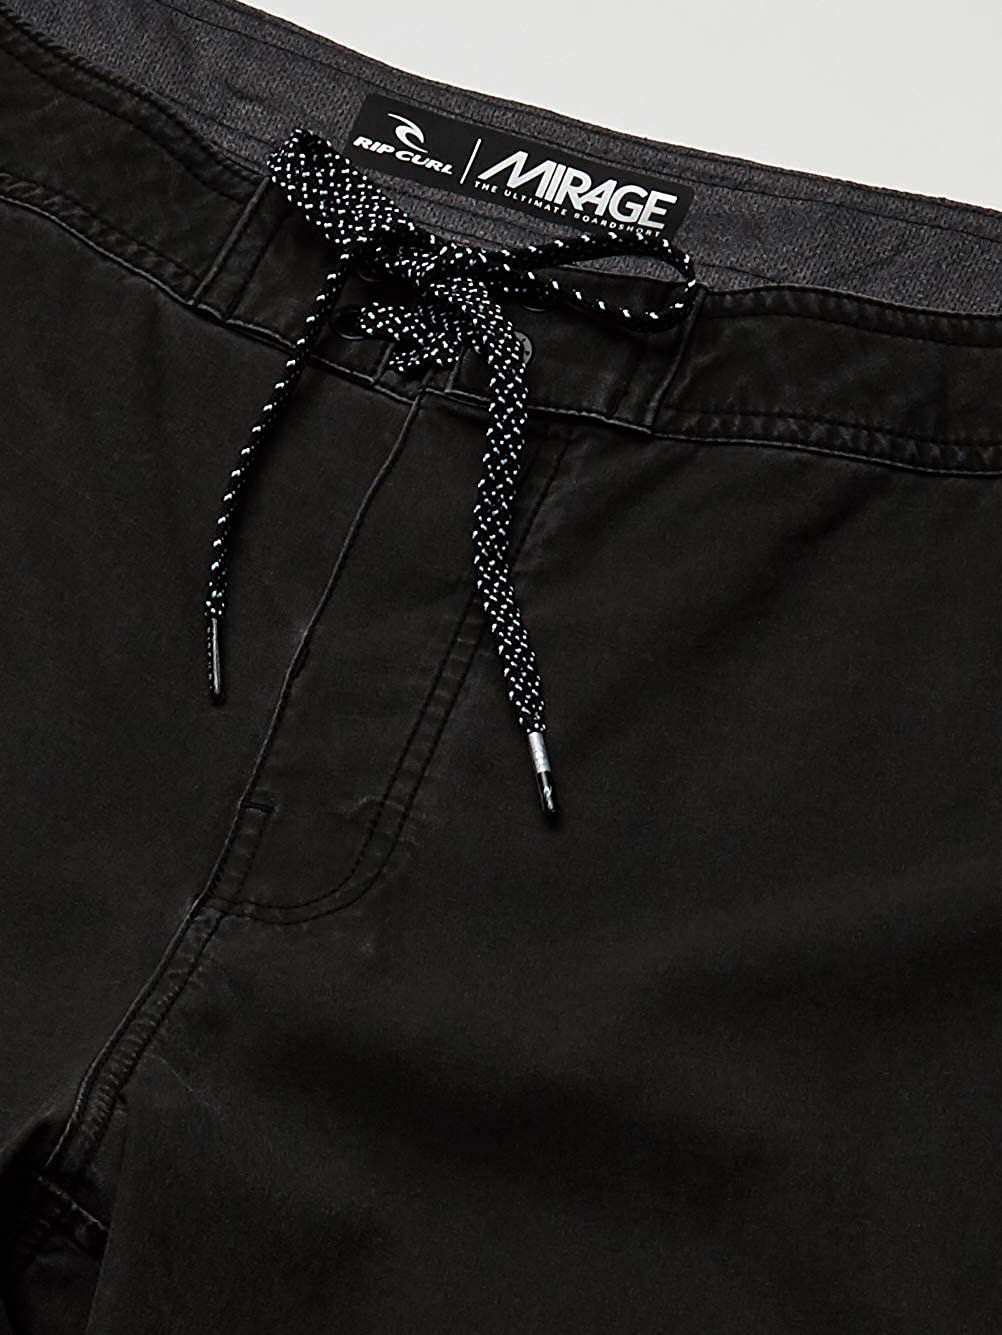 Rip Curl Mens Mirage Core 18 Boardshorts